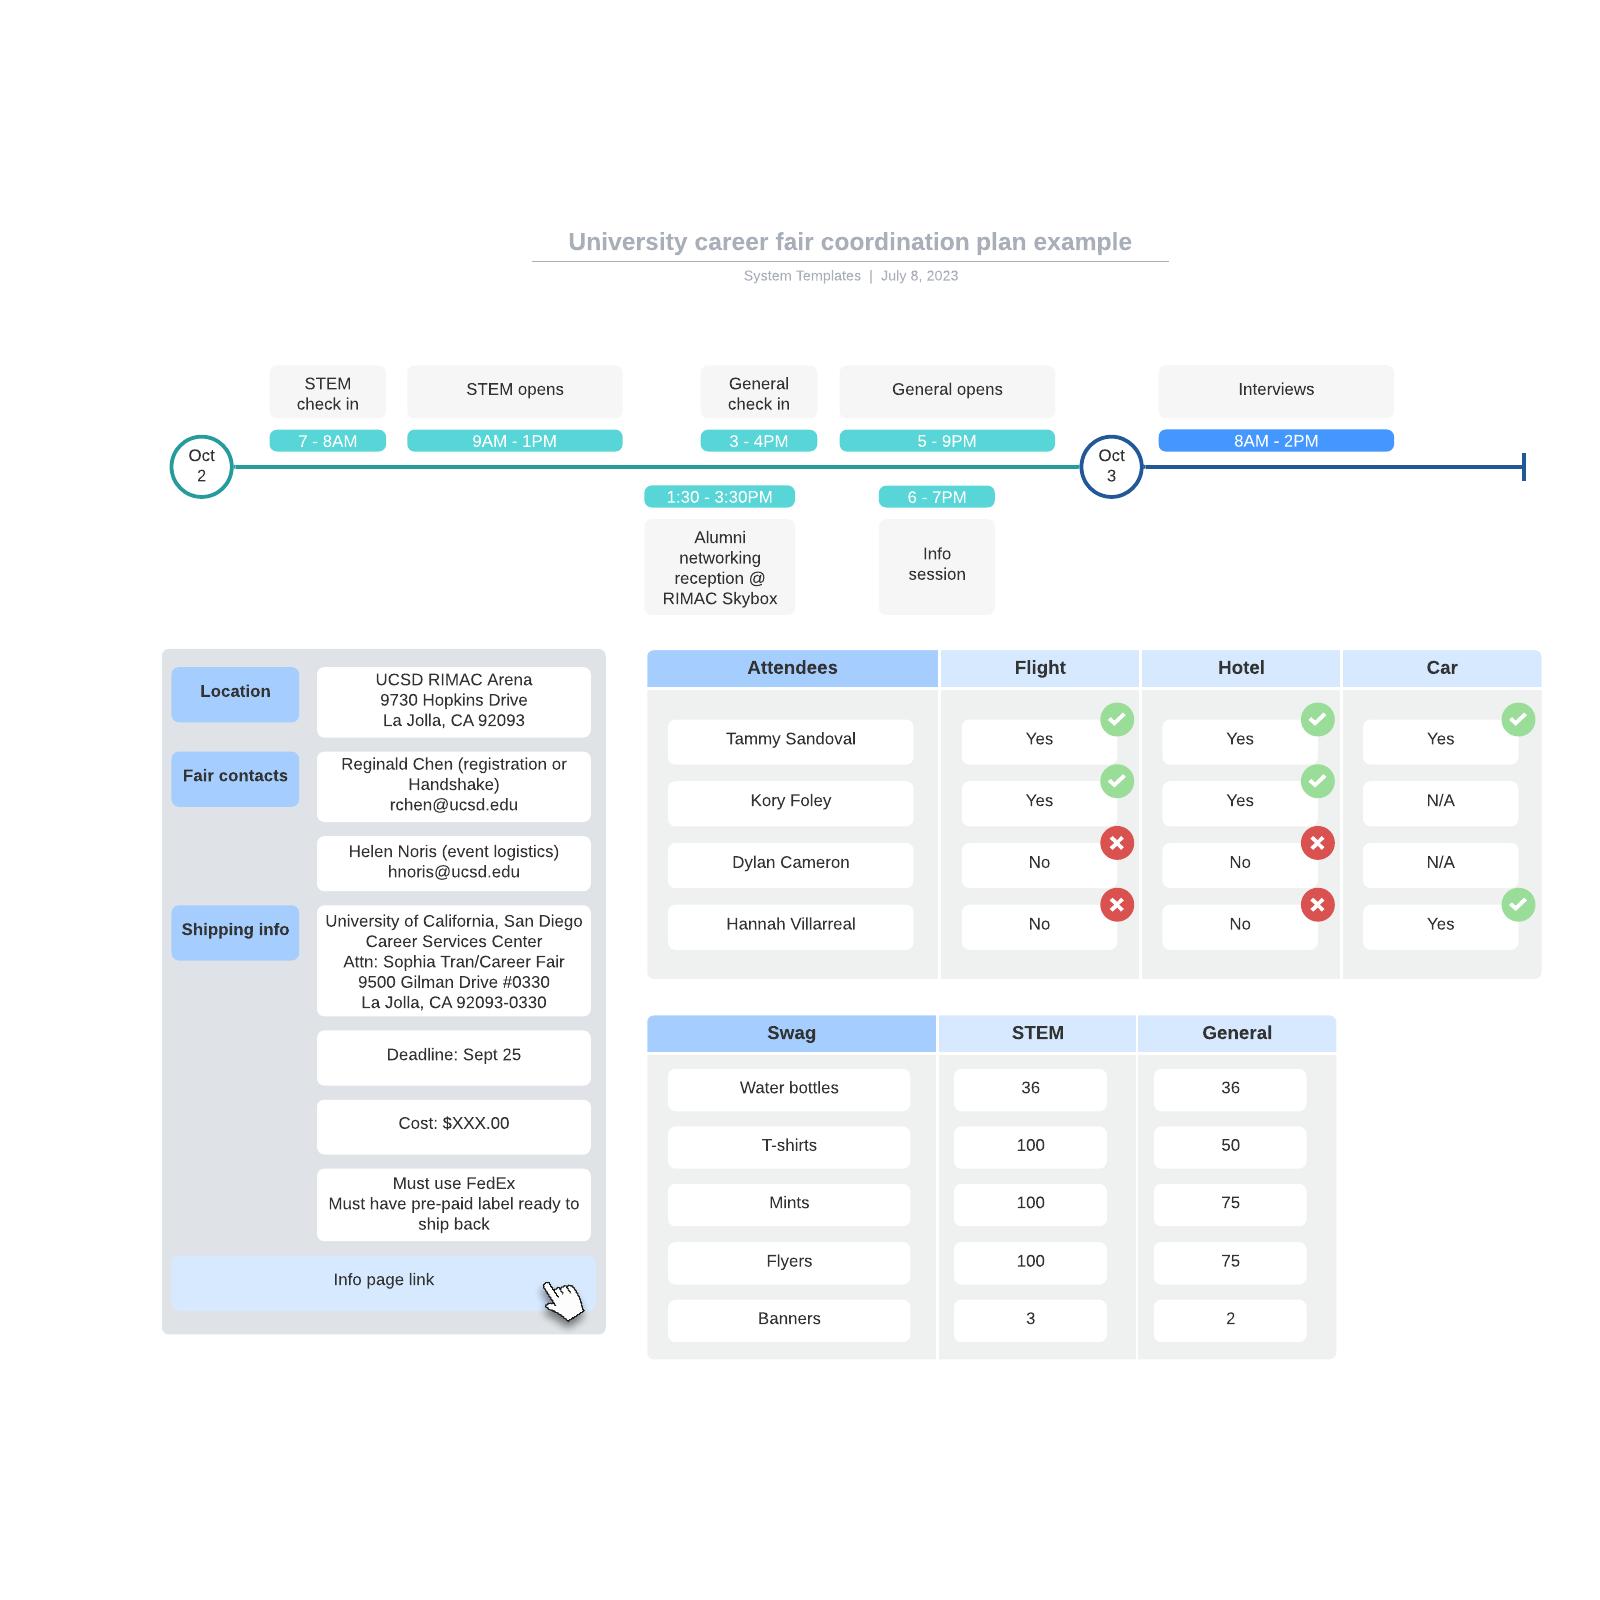 University career fair coordination plan example